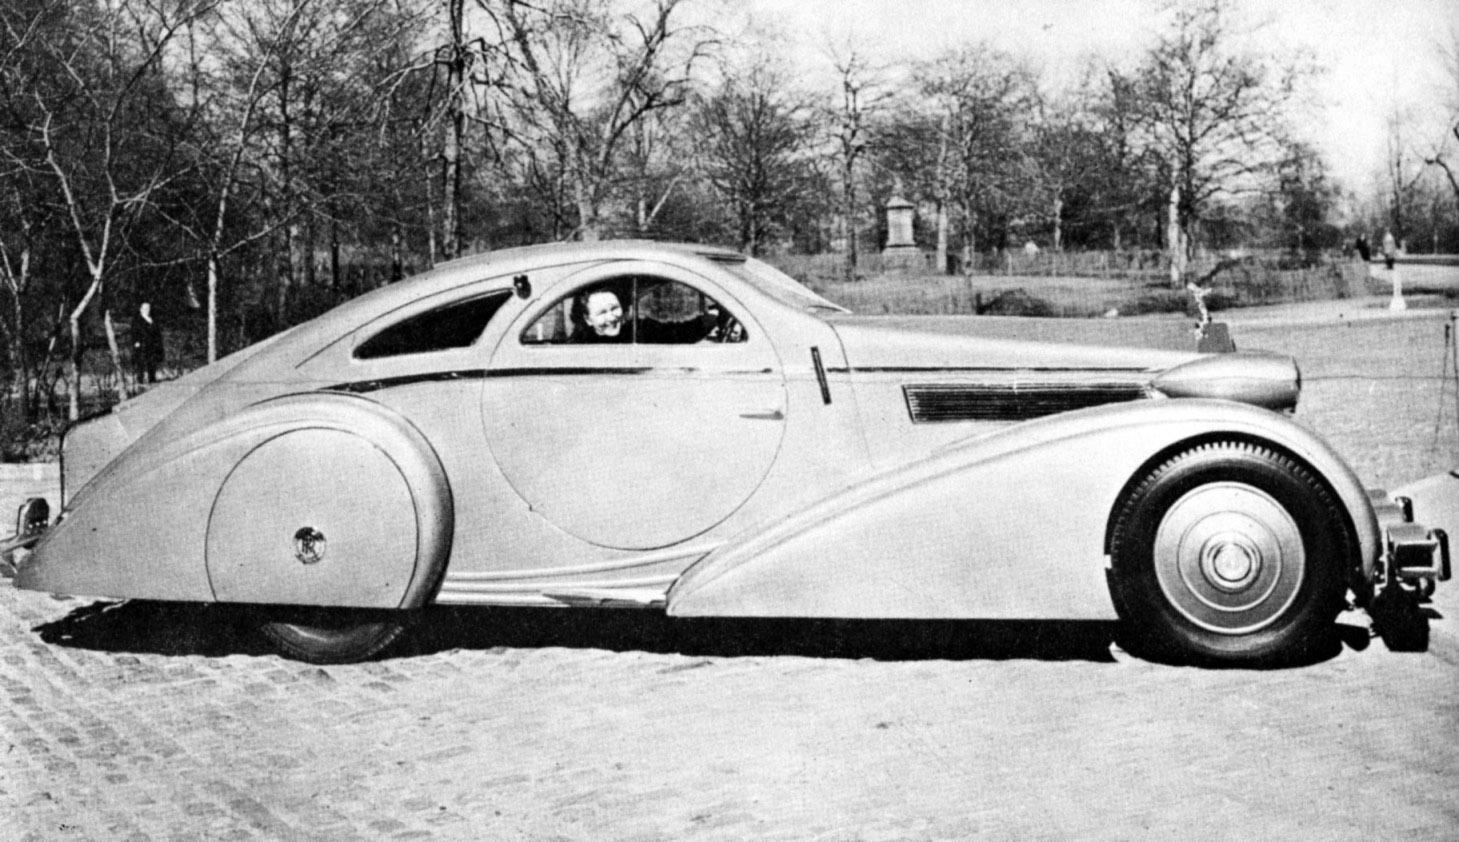 1925 Rolls Royce Phantom >> 1925 Rolls Royce Phantom I Jonckheere Aerodynamic Coupe